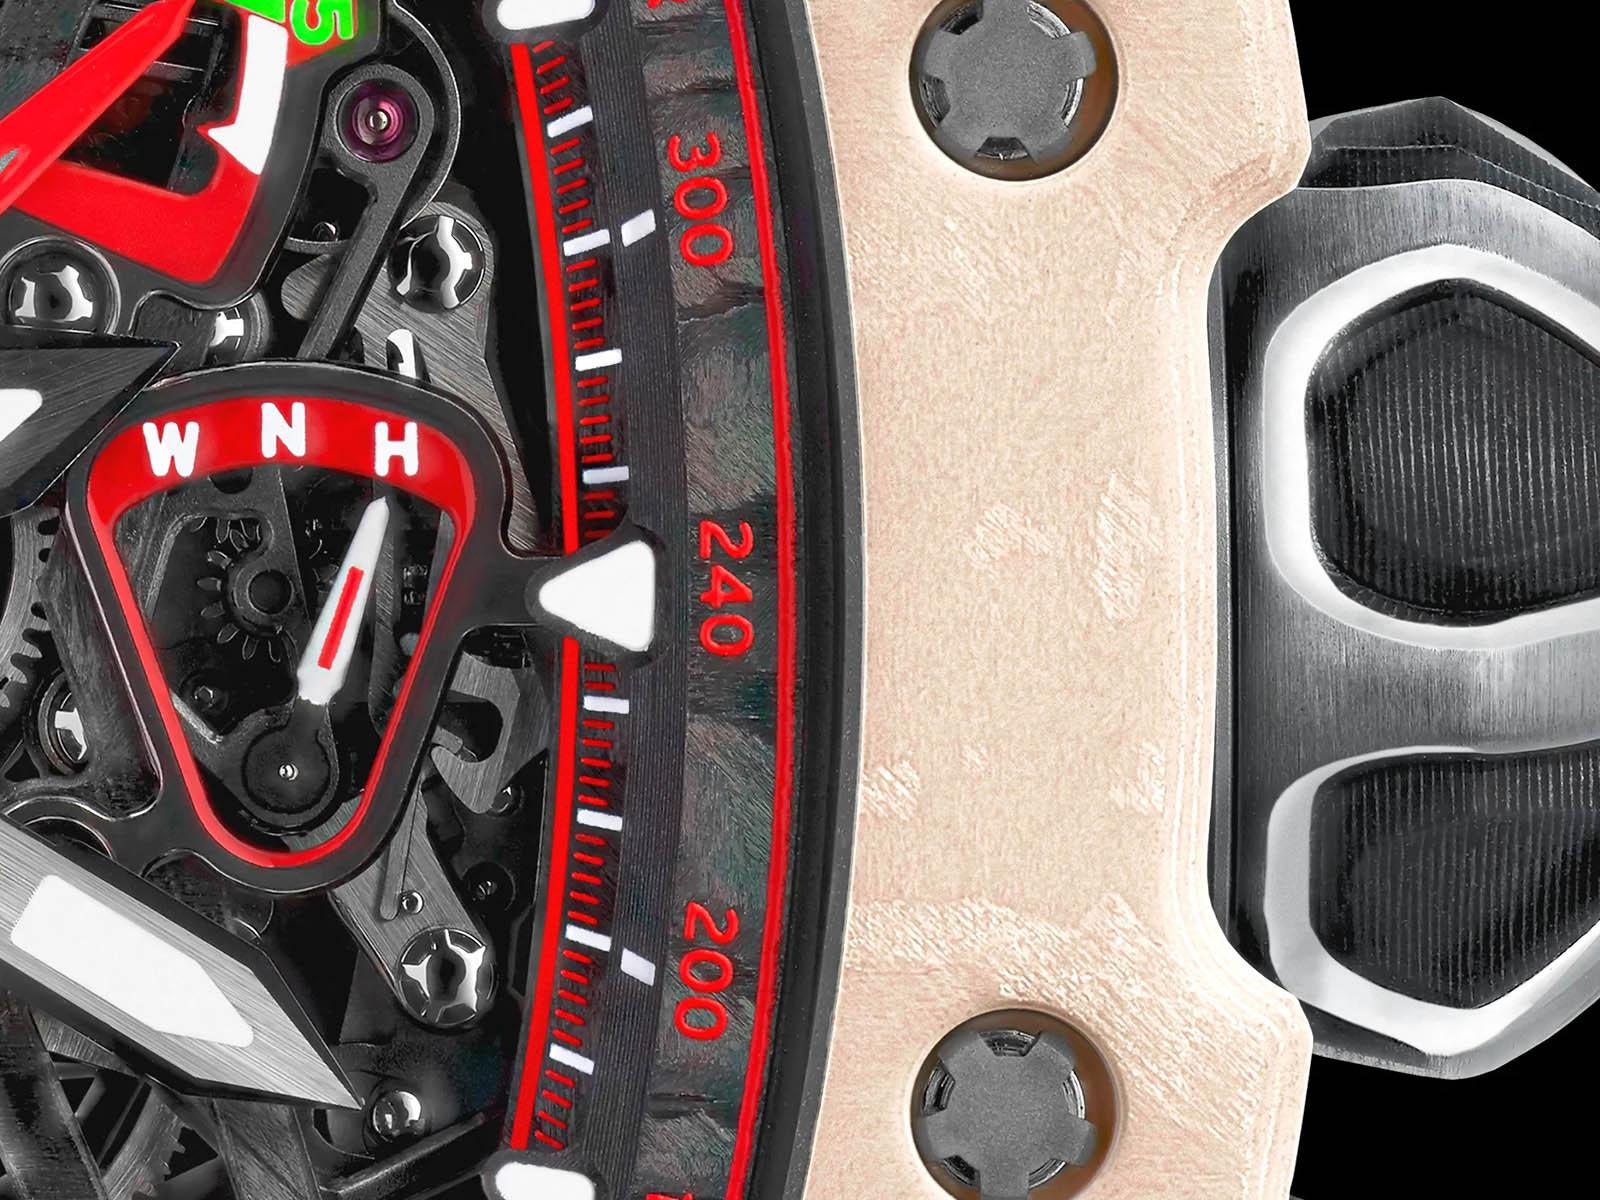 richard-mille-rm-50-04-tourbillon-split-seconds-chronograph-7.jpg